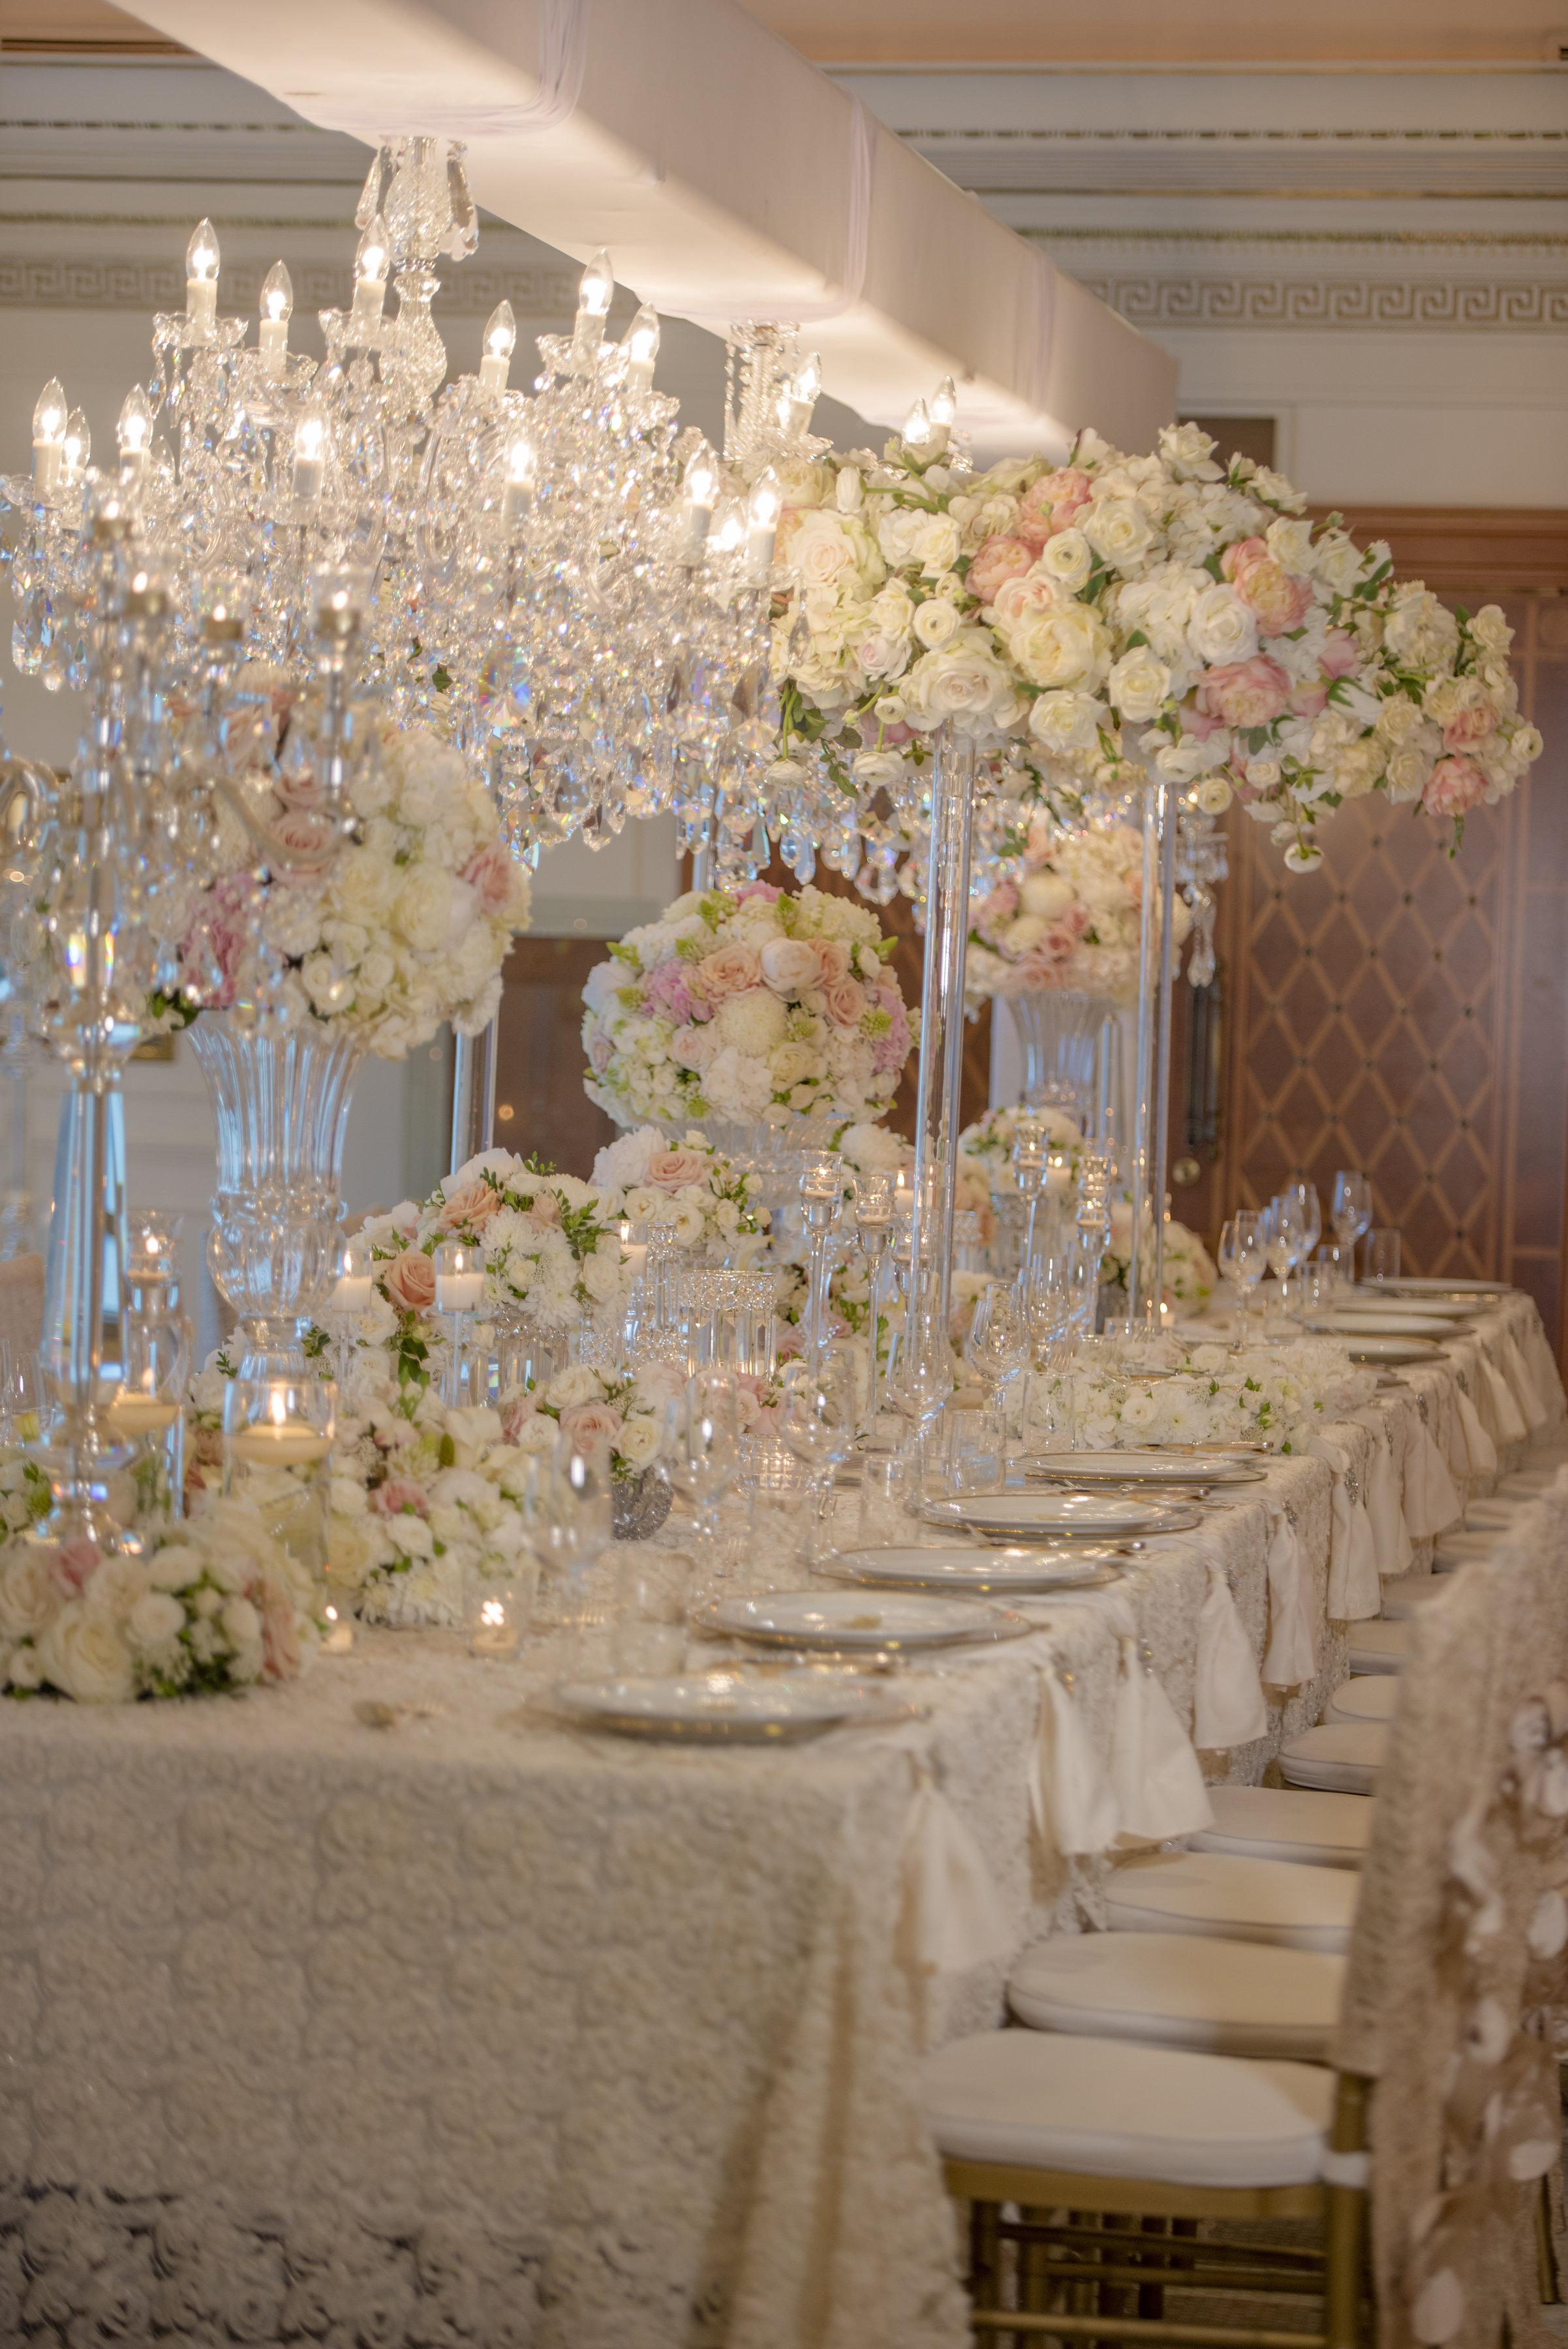 Hire_Ivory_rose_luxury_linen_sydney_wedding_decor_event_Versace_Decor_king_table_crystal 2.jpg